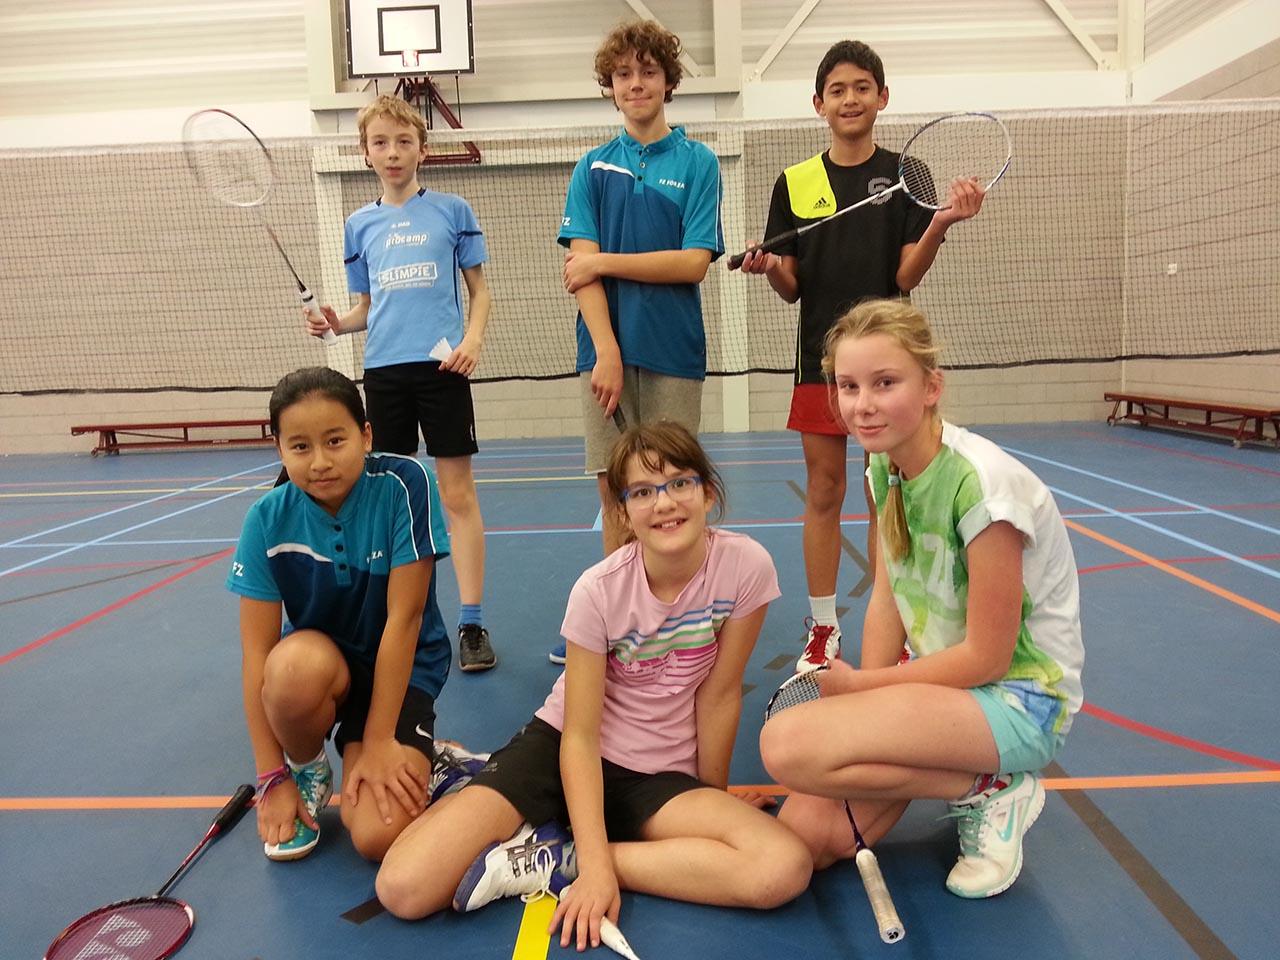 Badminton Nederland Noord Holland Competitie | Share The ... Badminton Nederland Competitie